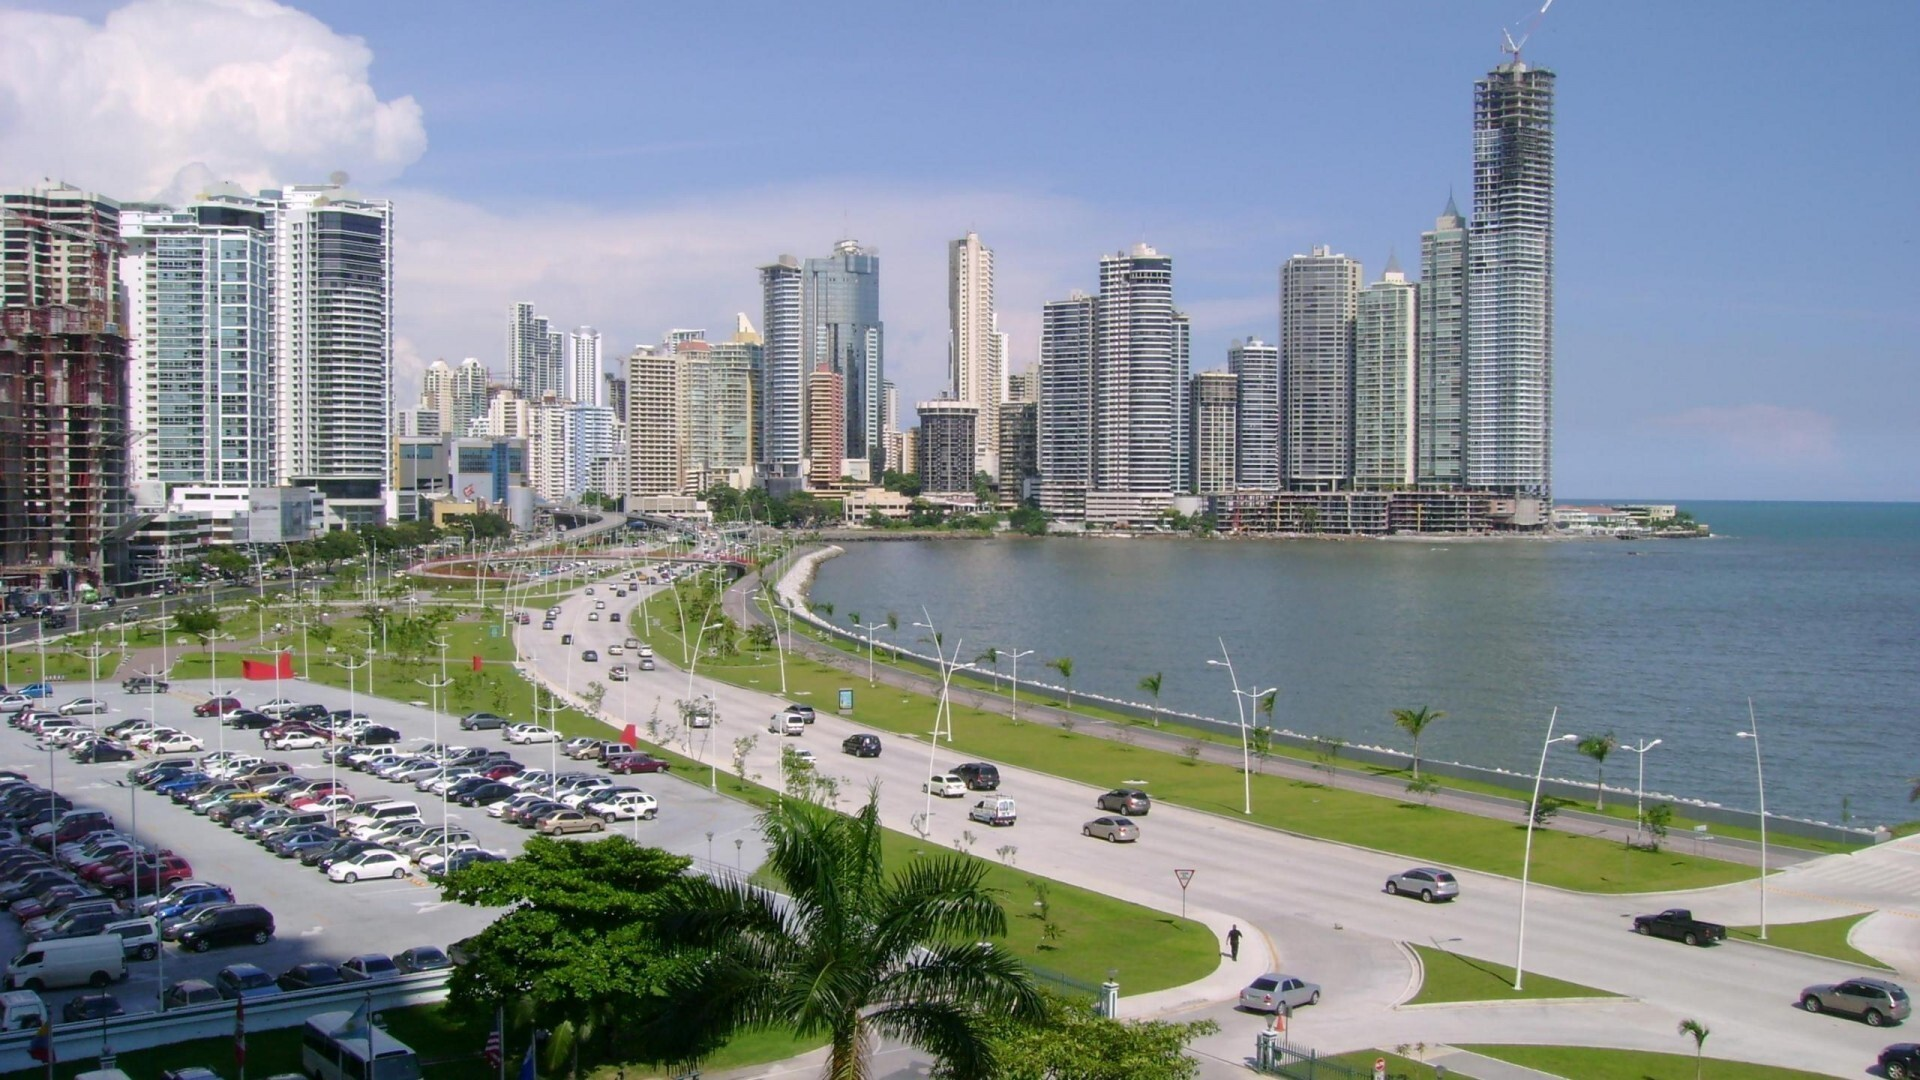 Beautiful Central America Panama City